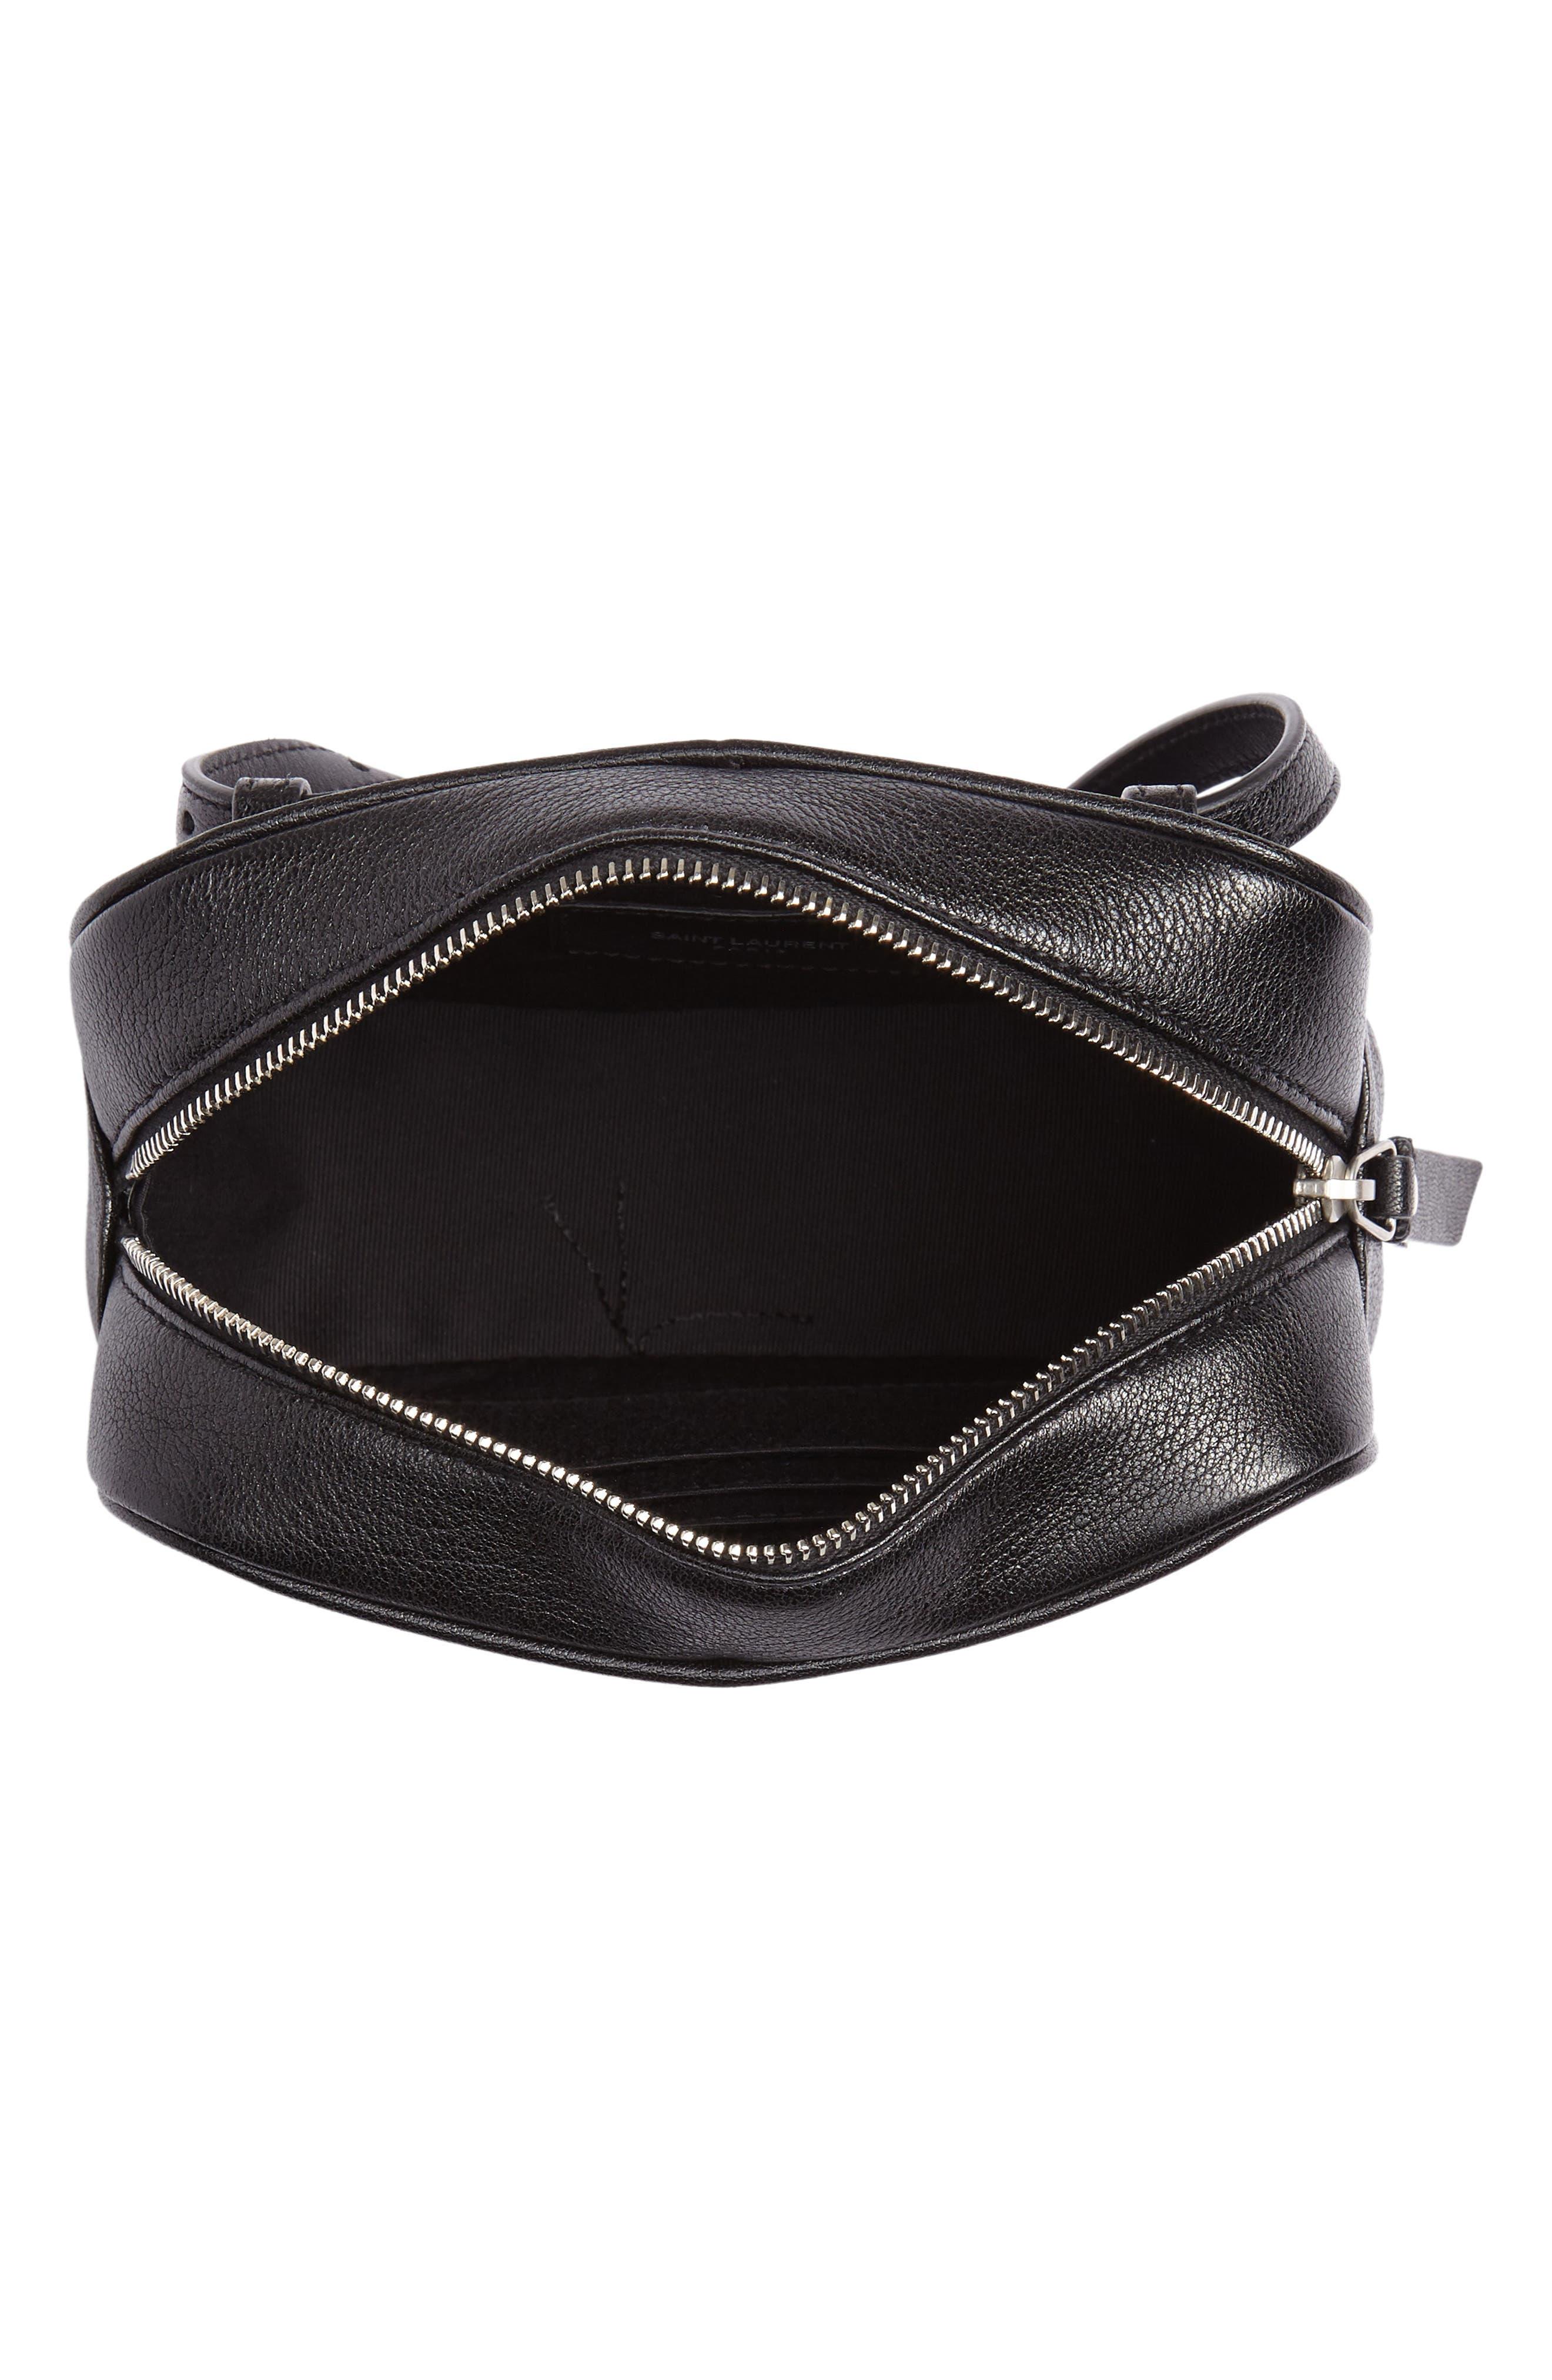 Loulou Tassel Leather Belt Bag,                             Alternate thumbnail 5, color,                             Noir